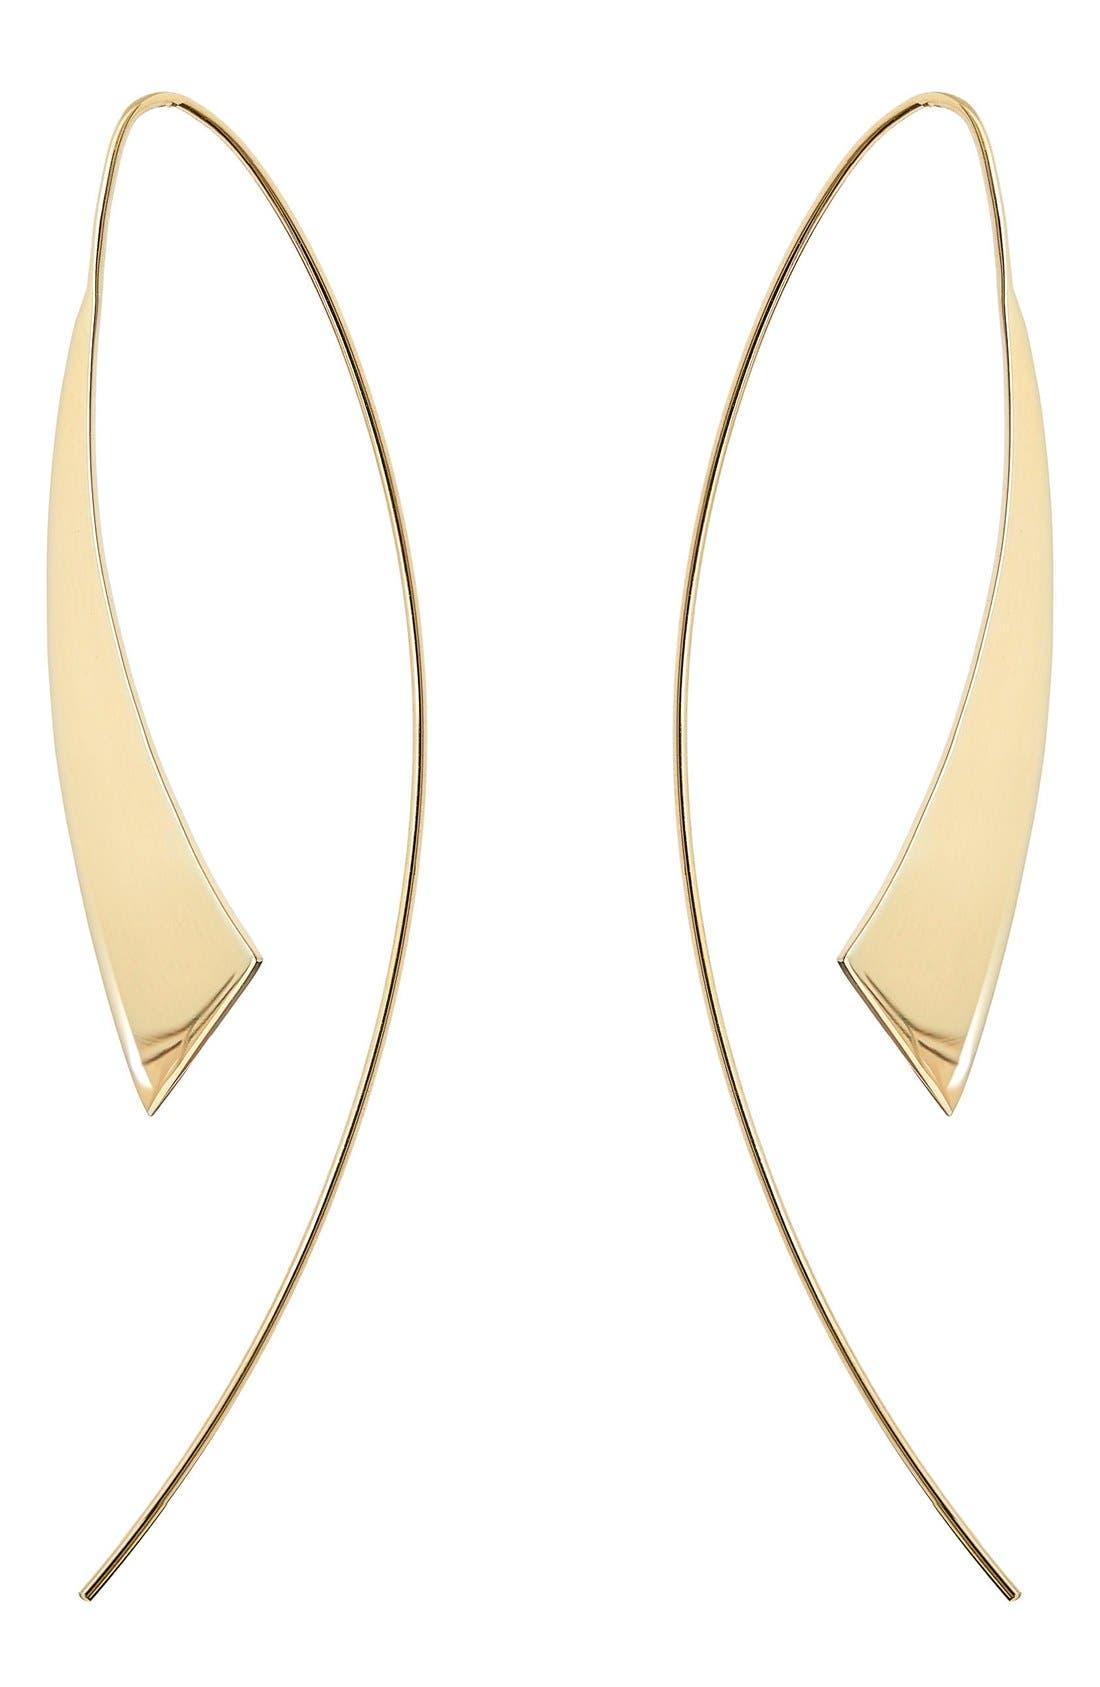 Lana Jewelry Threader Earrings